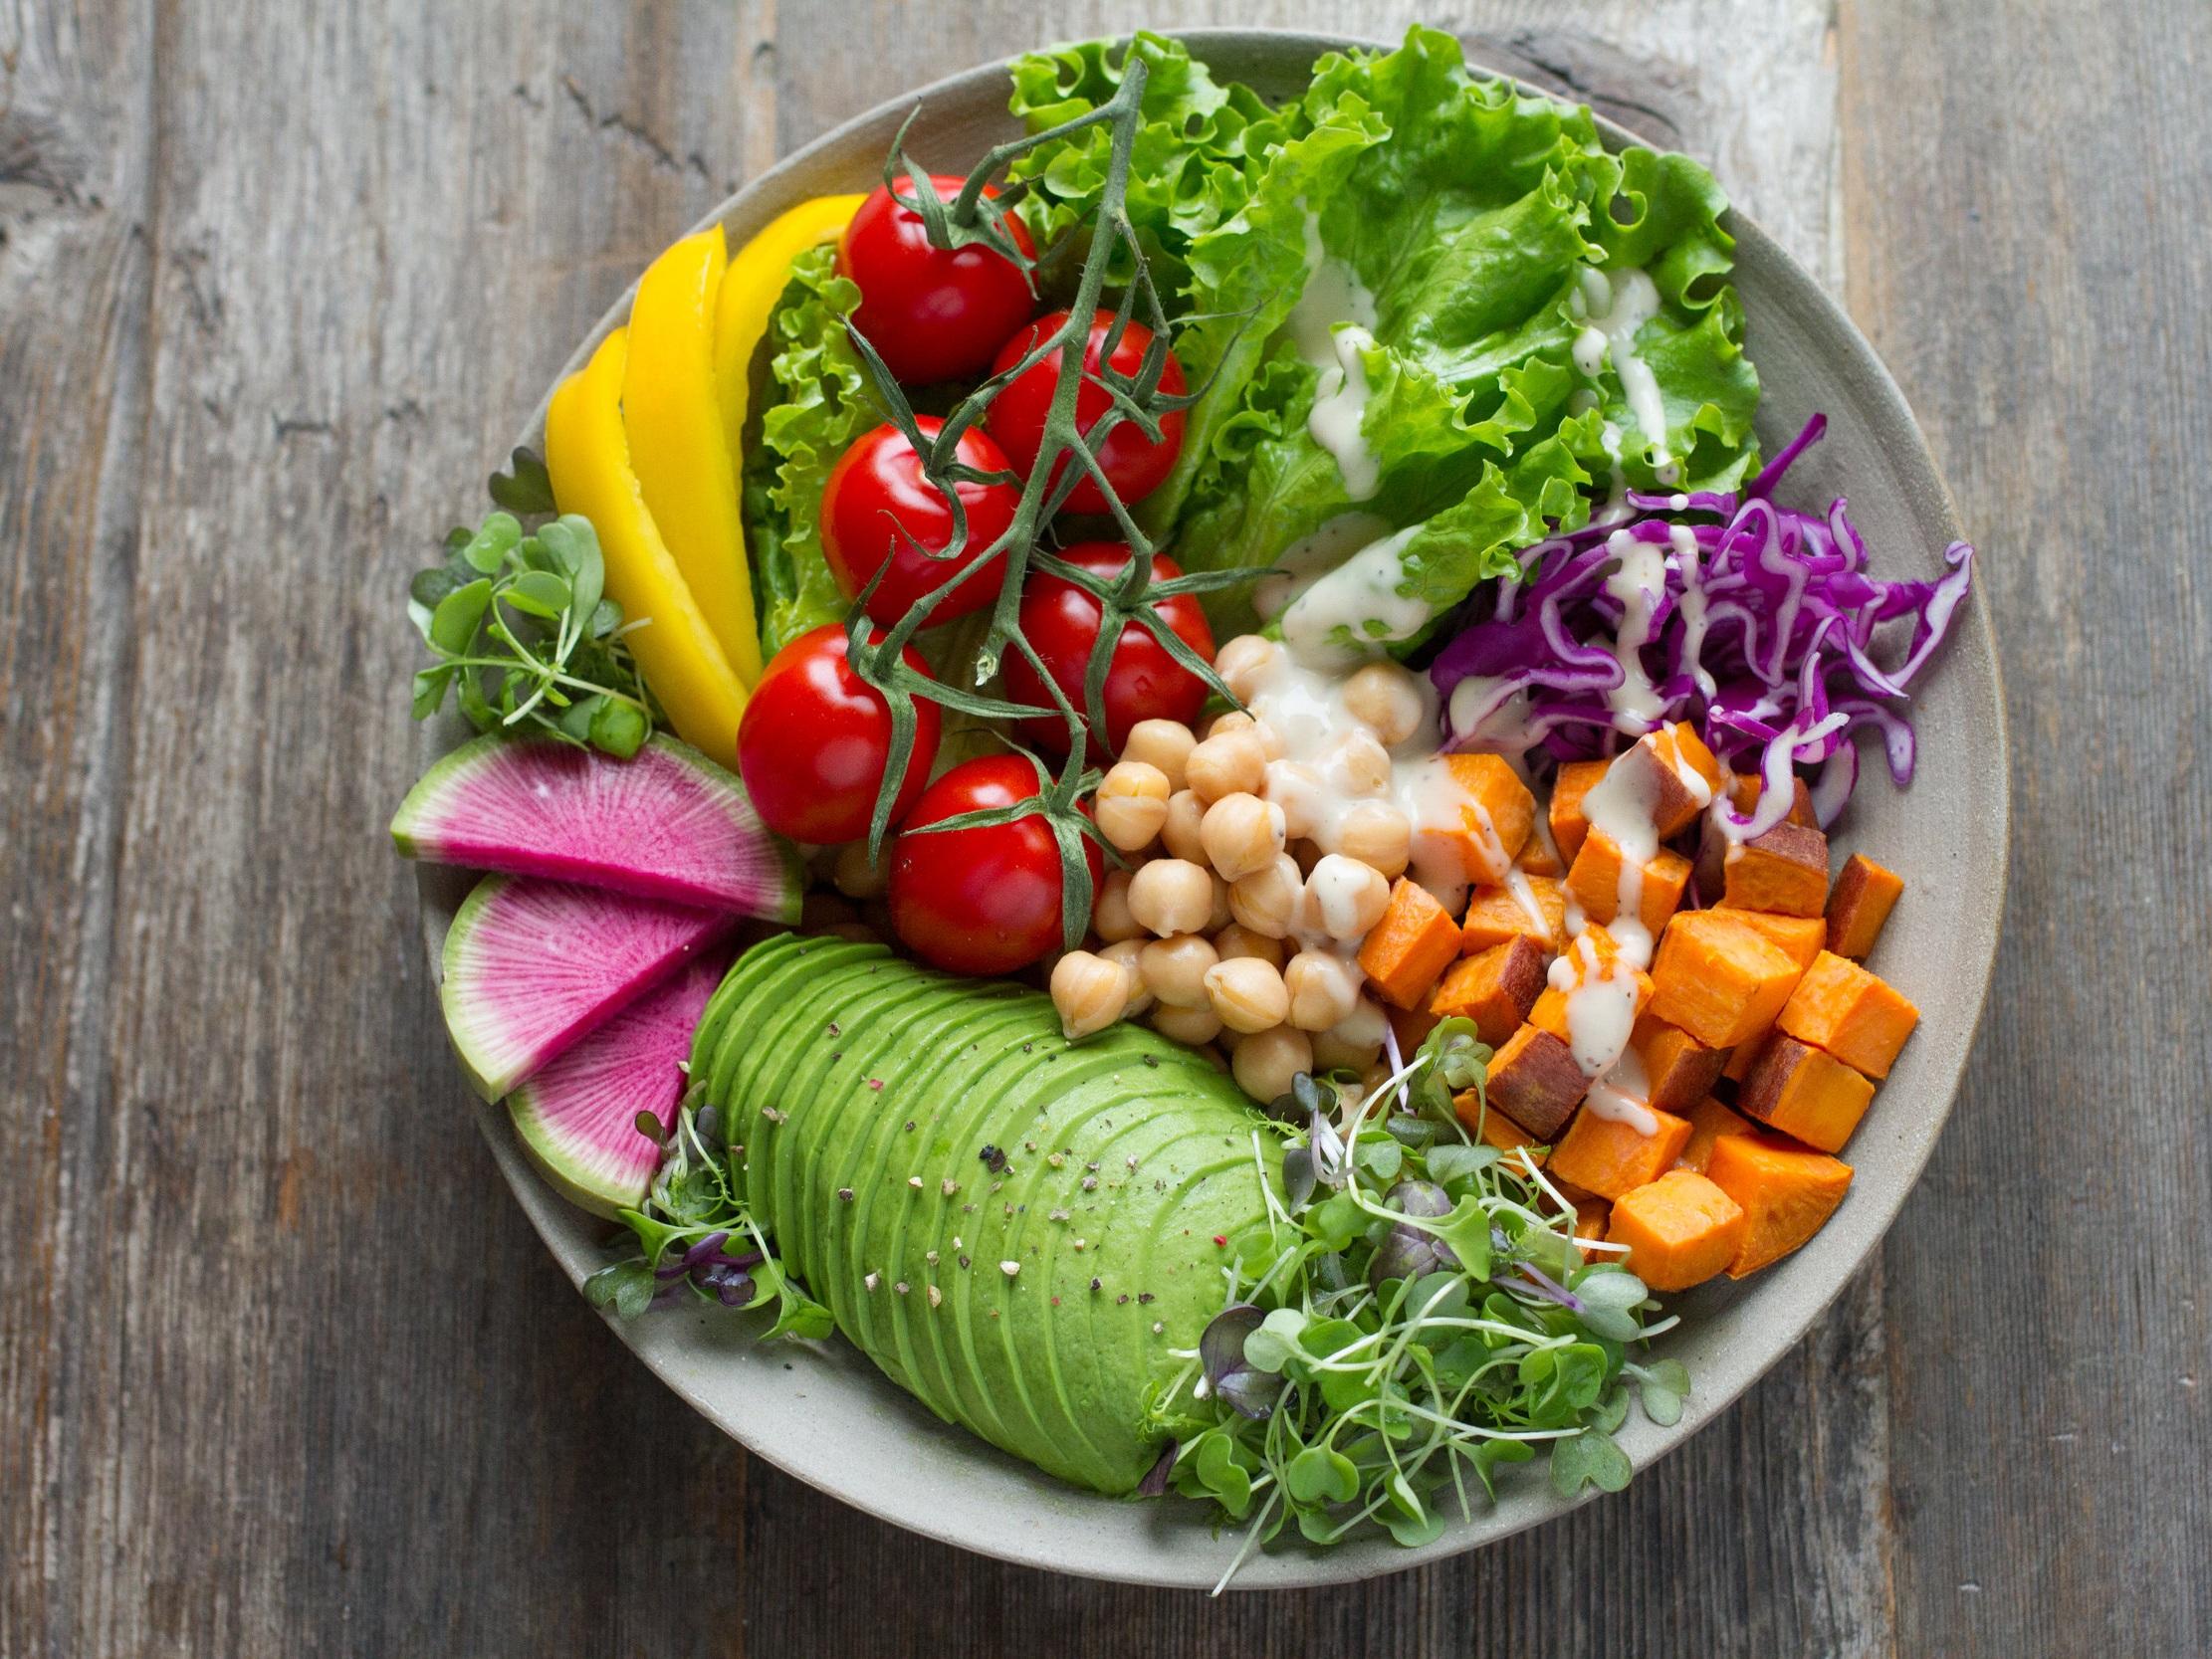 parkinsons_constipation_tips_helpful_foods_supplements